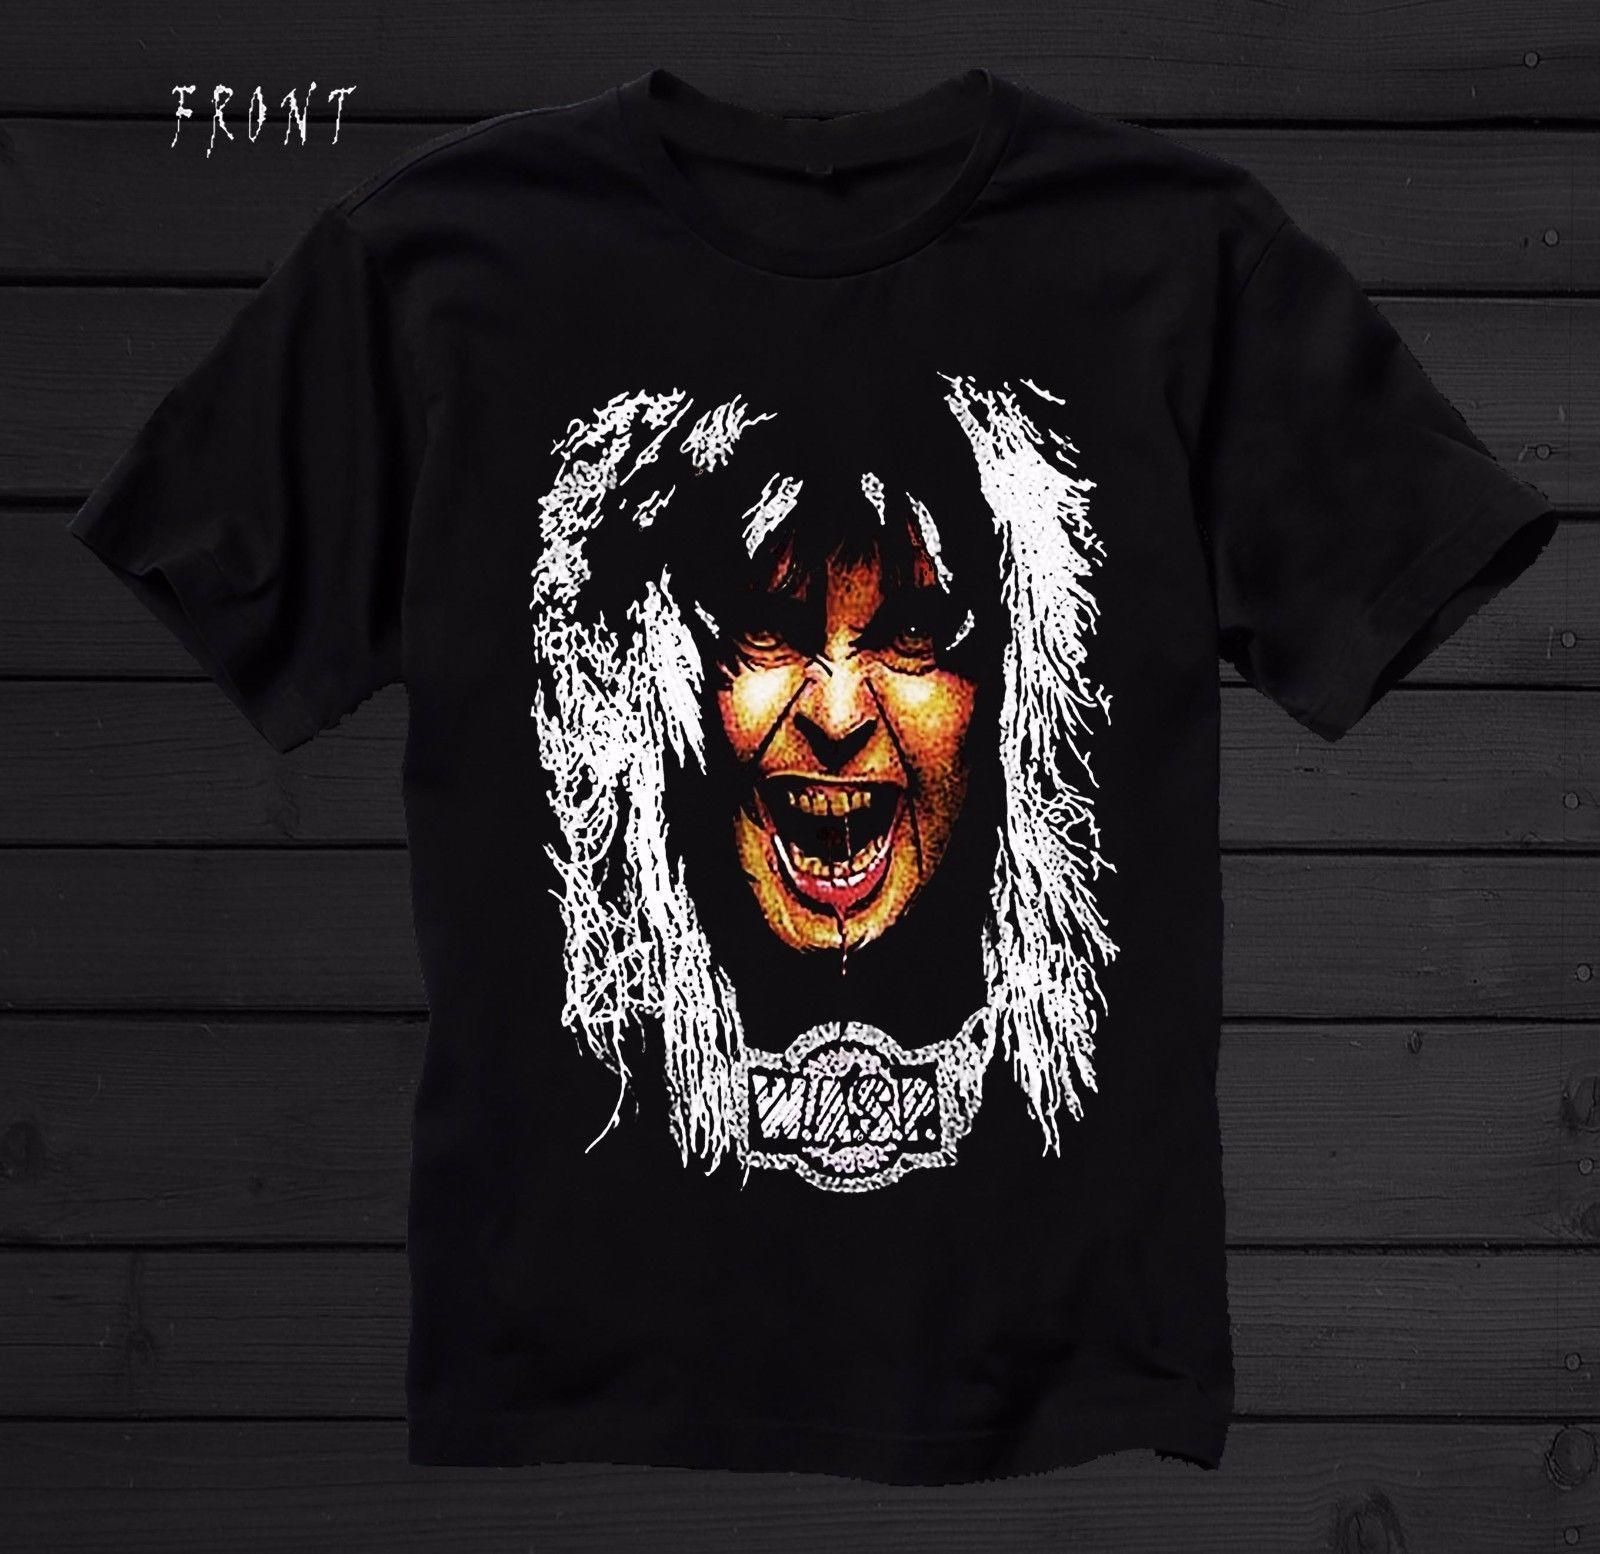 W.A.S.P.-American heavy metal bandlJudas Priest ,T-shirt-SIZES: S to 7XL